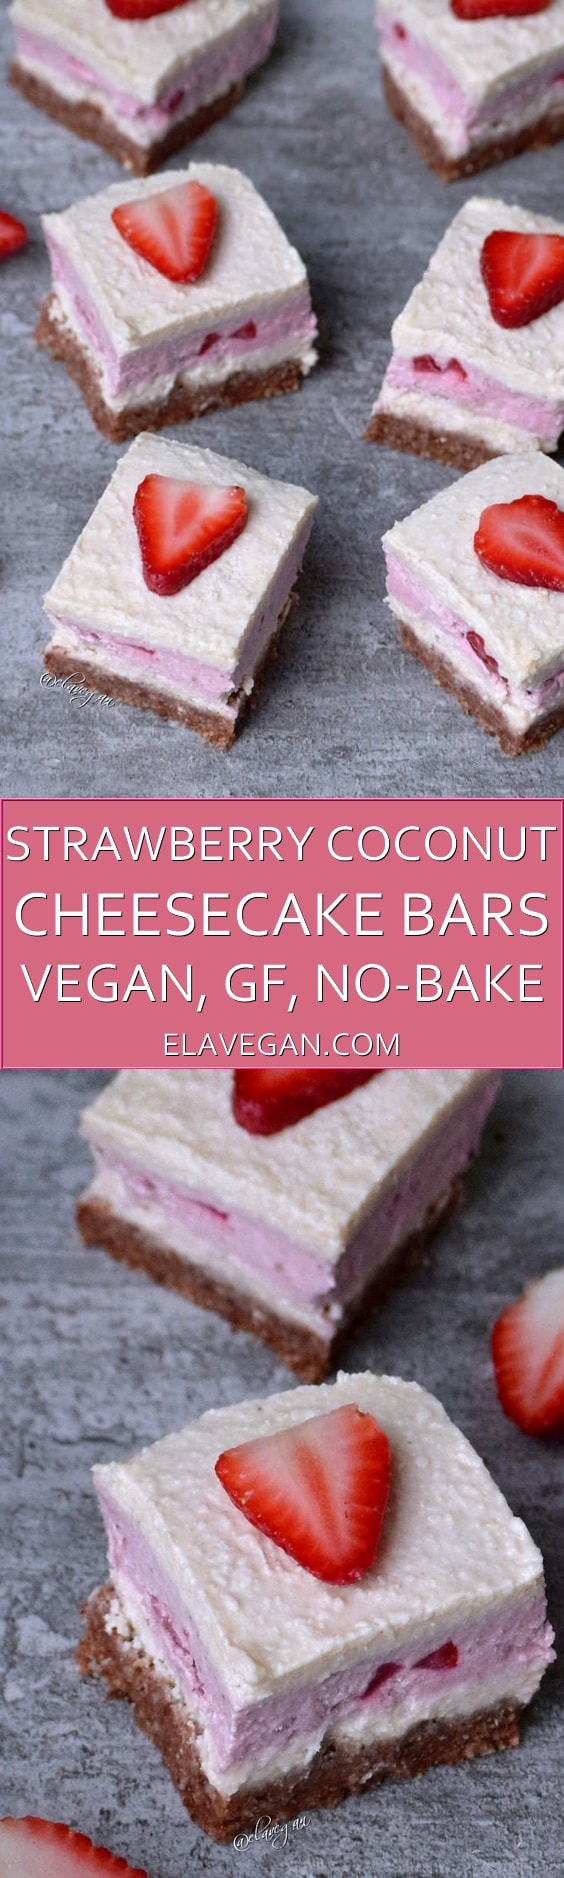 Strawberry coconut cheesecake bars pinterest